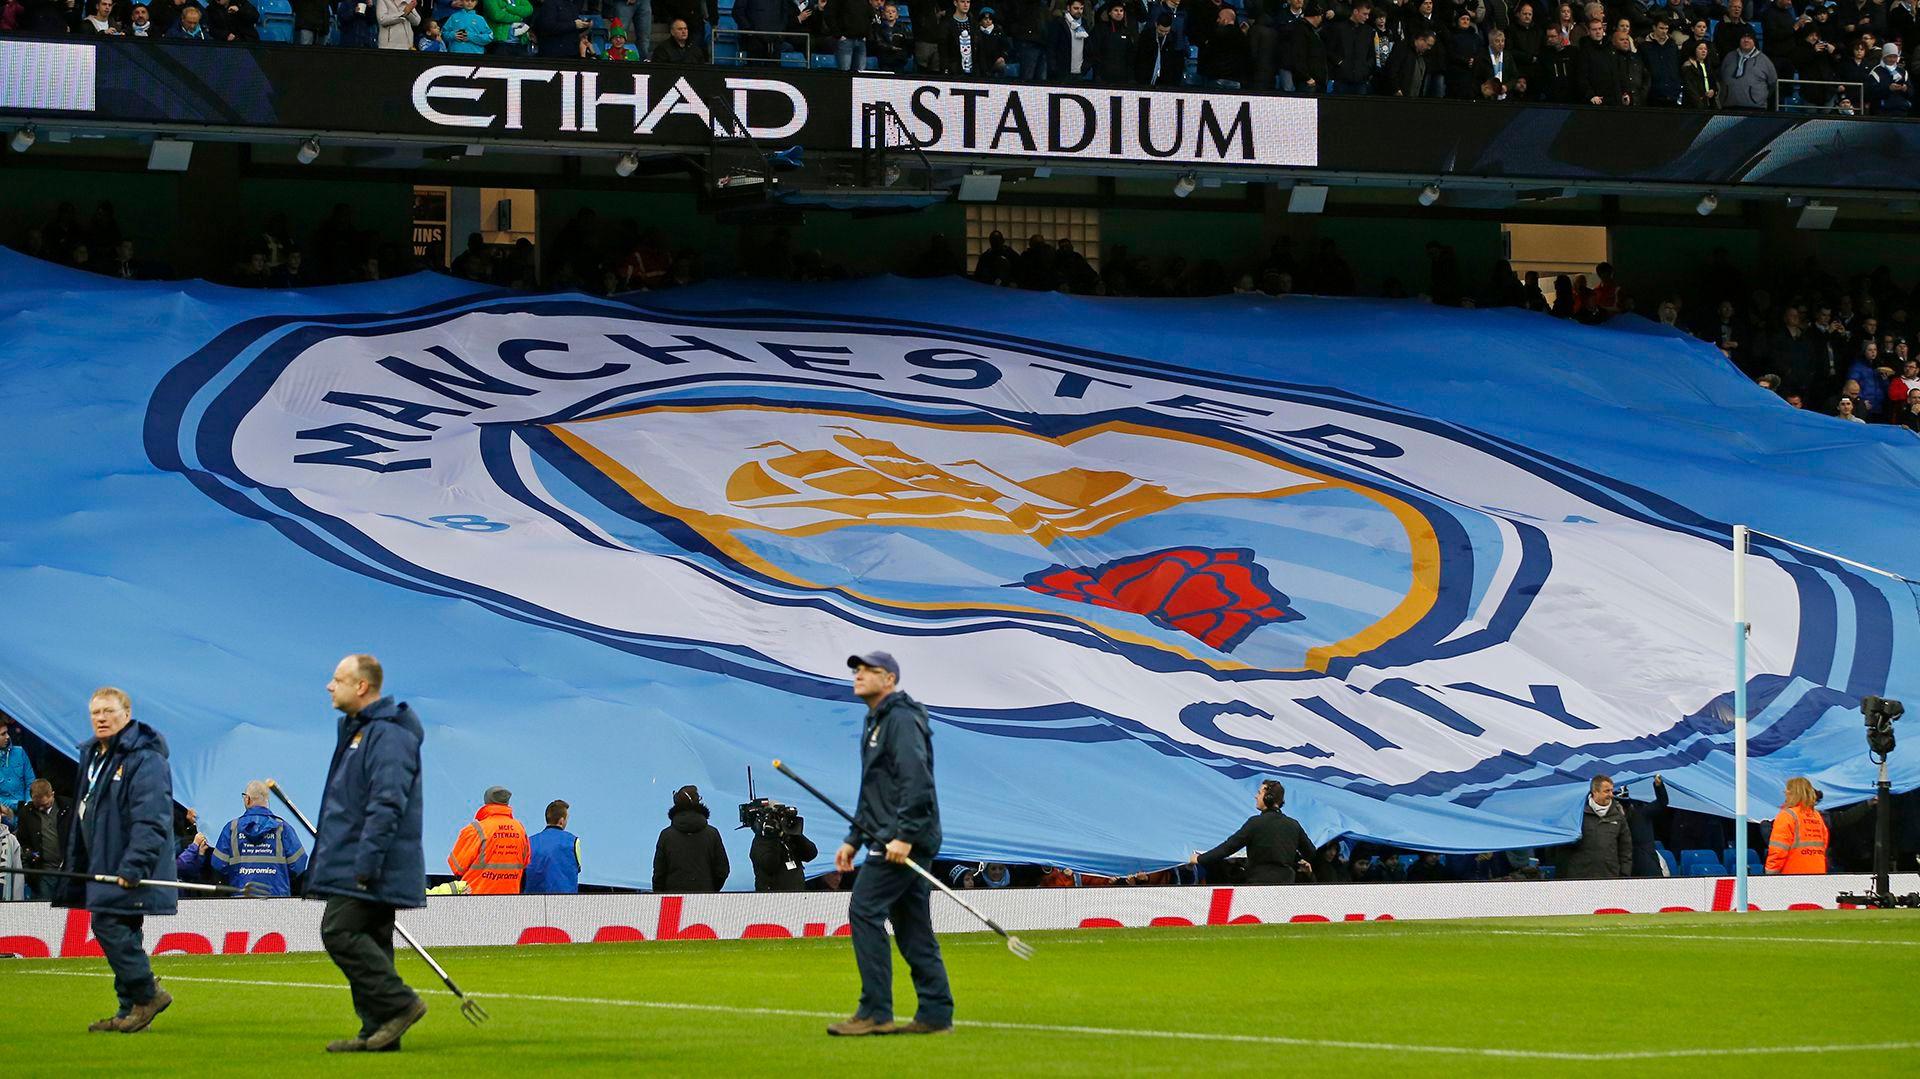 Manchester City escudo